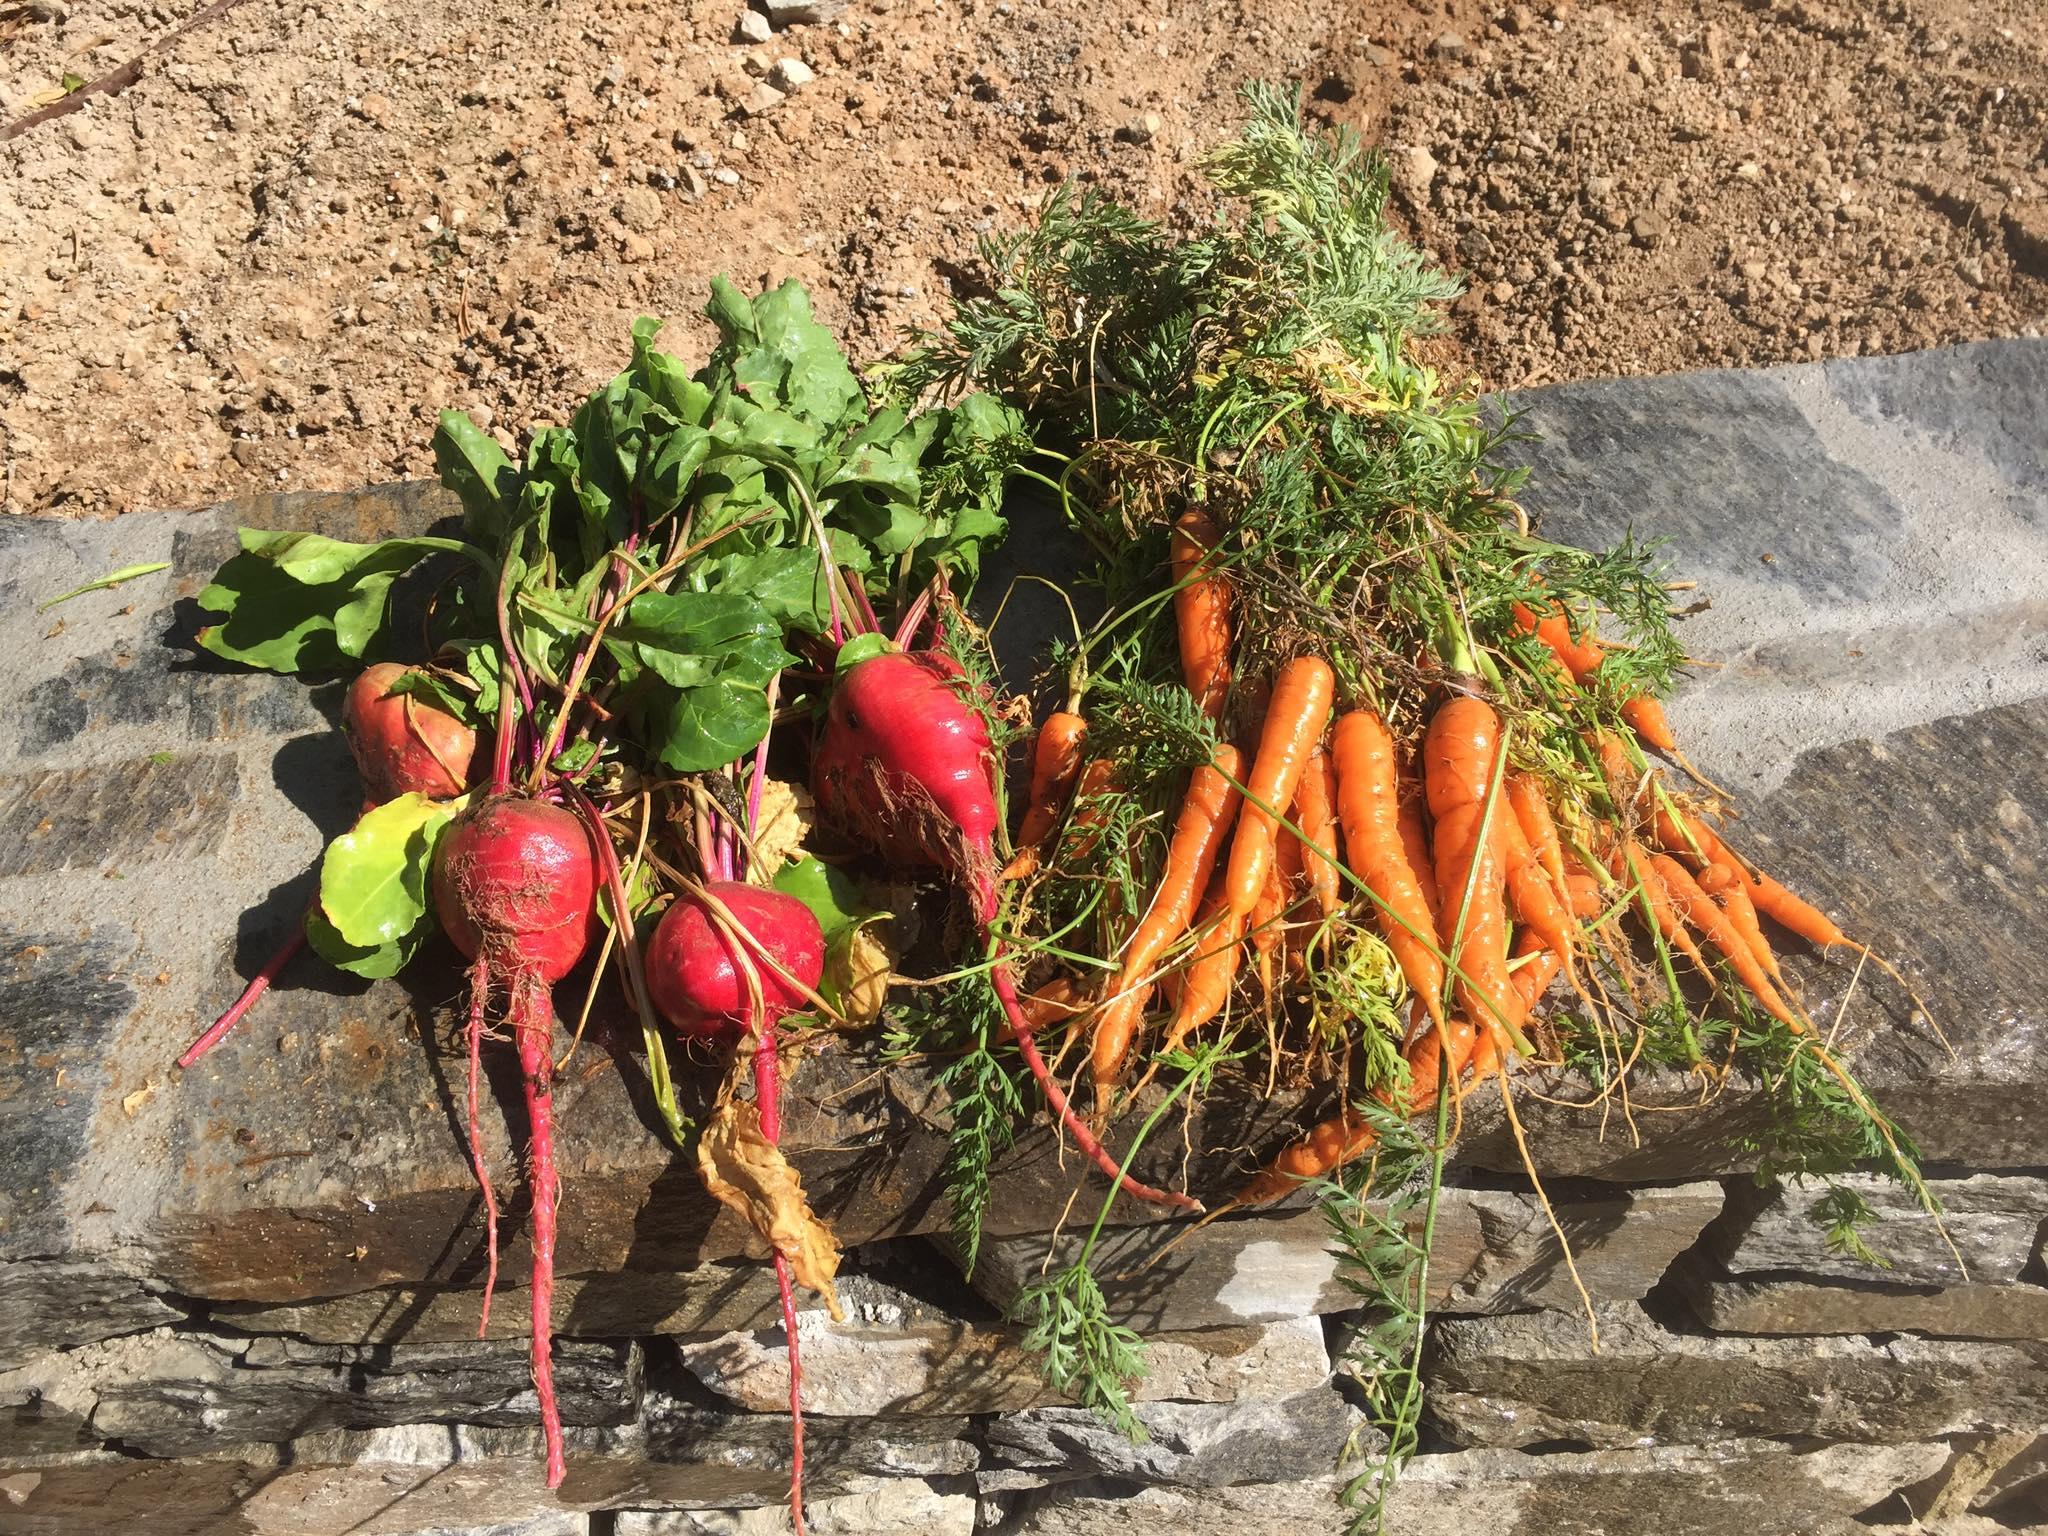 Radish & Carrot Roots